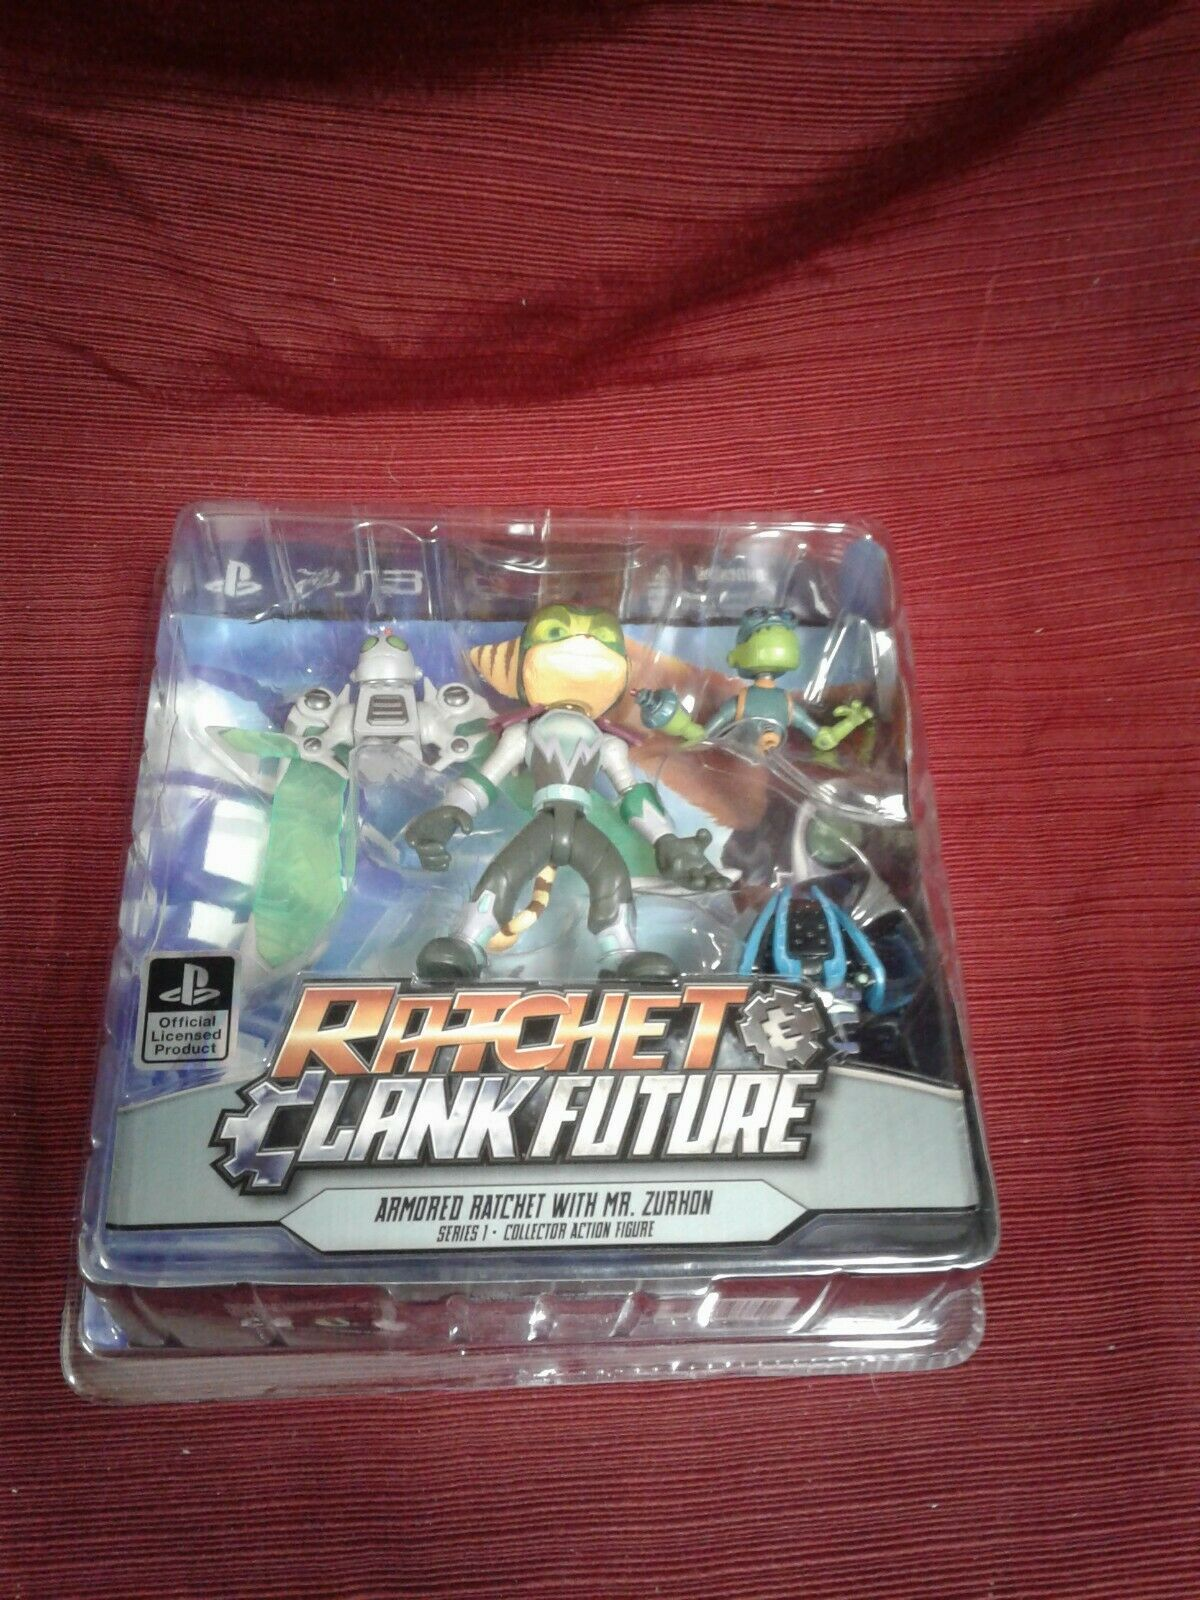 Rare sealed Ratchet Clank Future Armorosso Ratchet Mr. Zurkon azione fig gift ps3